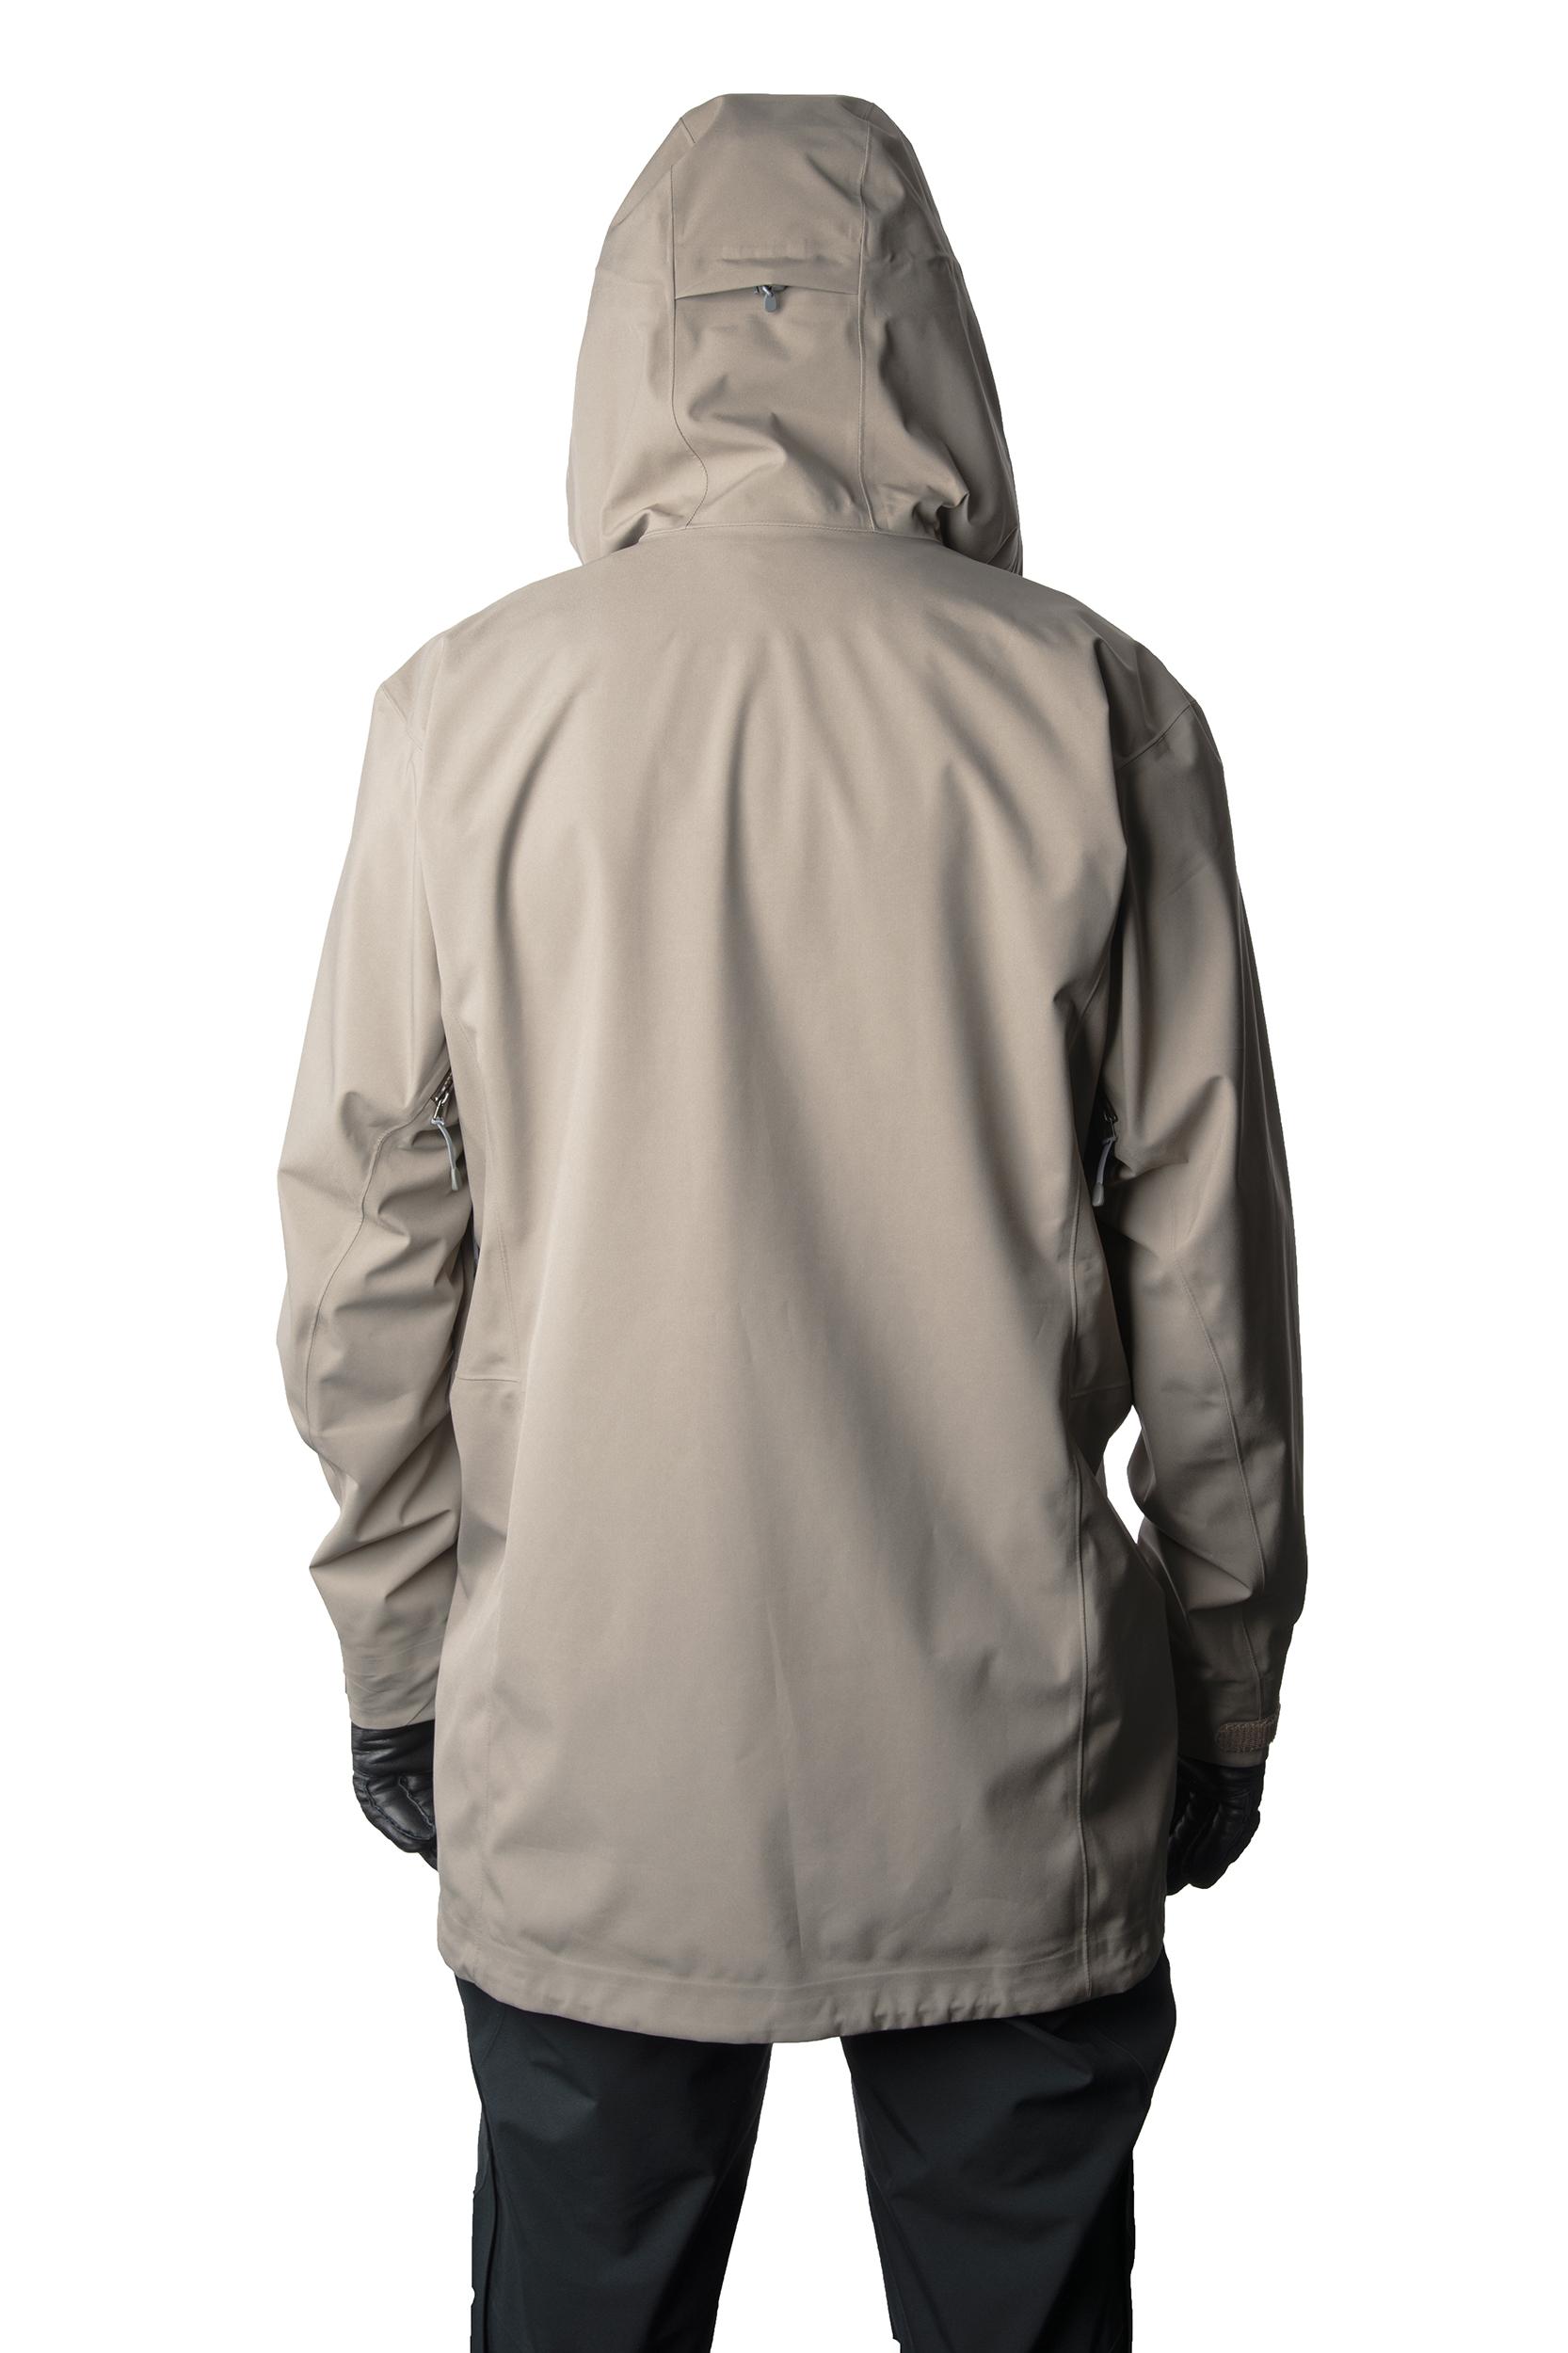 promo code stable quality latest design Houdini Leeward Rain Jacket - Men's | MEC